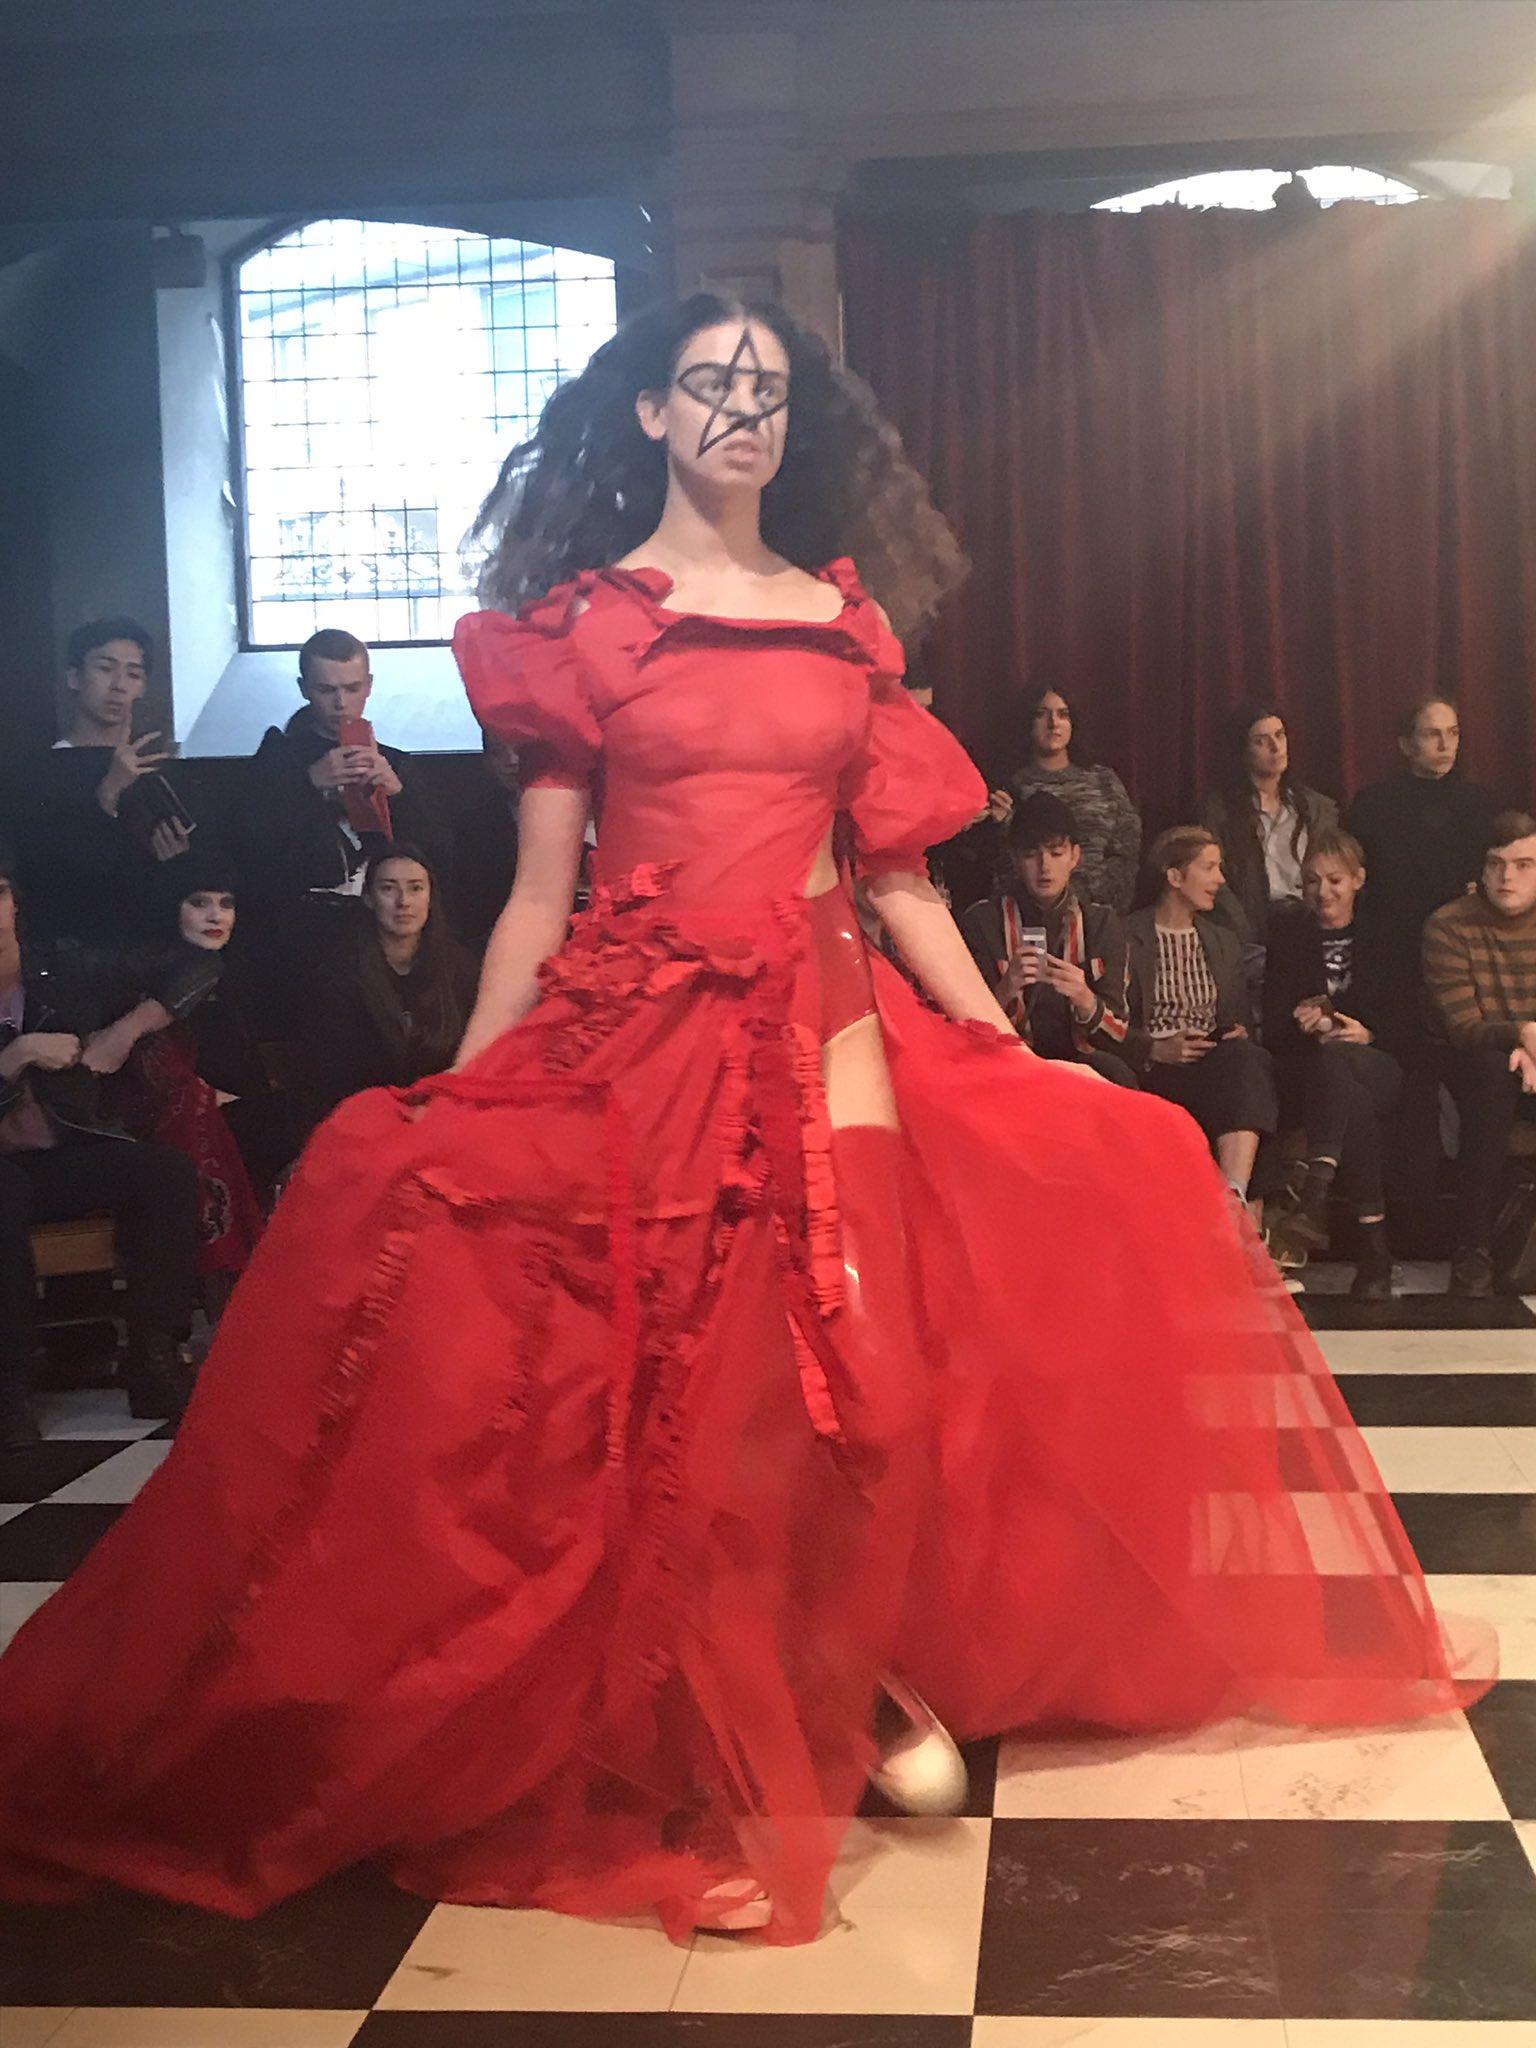 Order of program for church fashion show - Models Made Up Like Skeletons Vampires For Dilara Findikoglu Line At London Fashion Weekhttps T Co Nklzldmjxq Via Femail